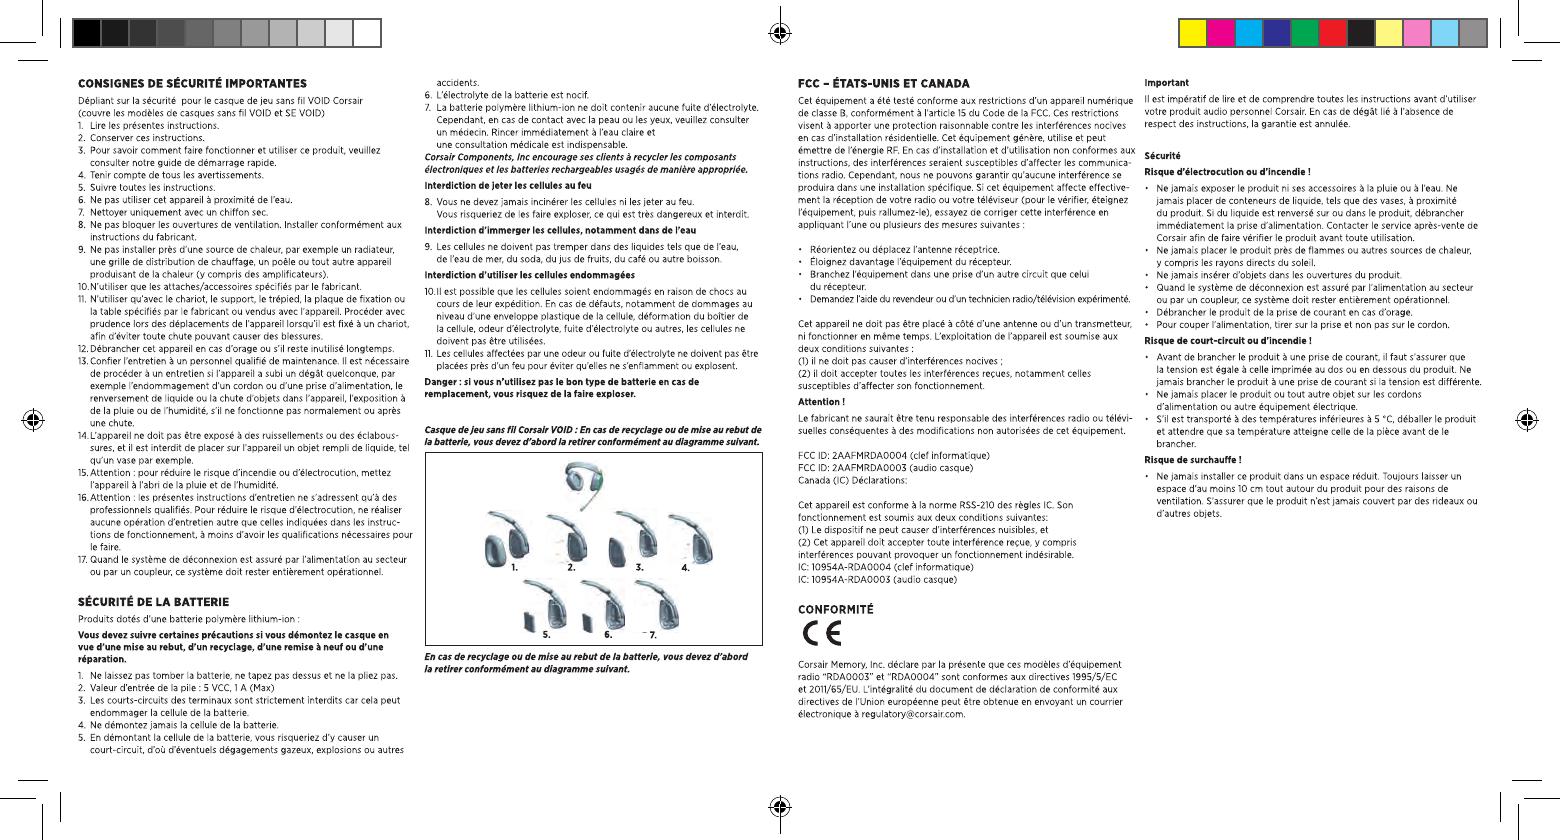 Corsair Memory RDA0004 USB dongle User Manual Part 1